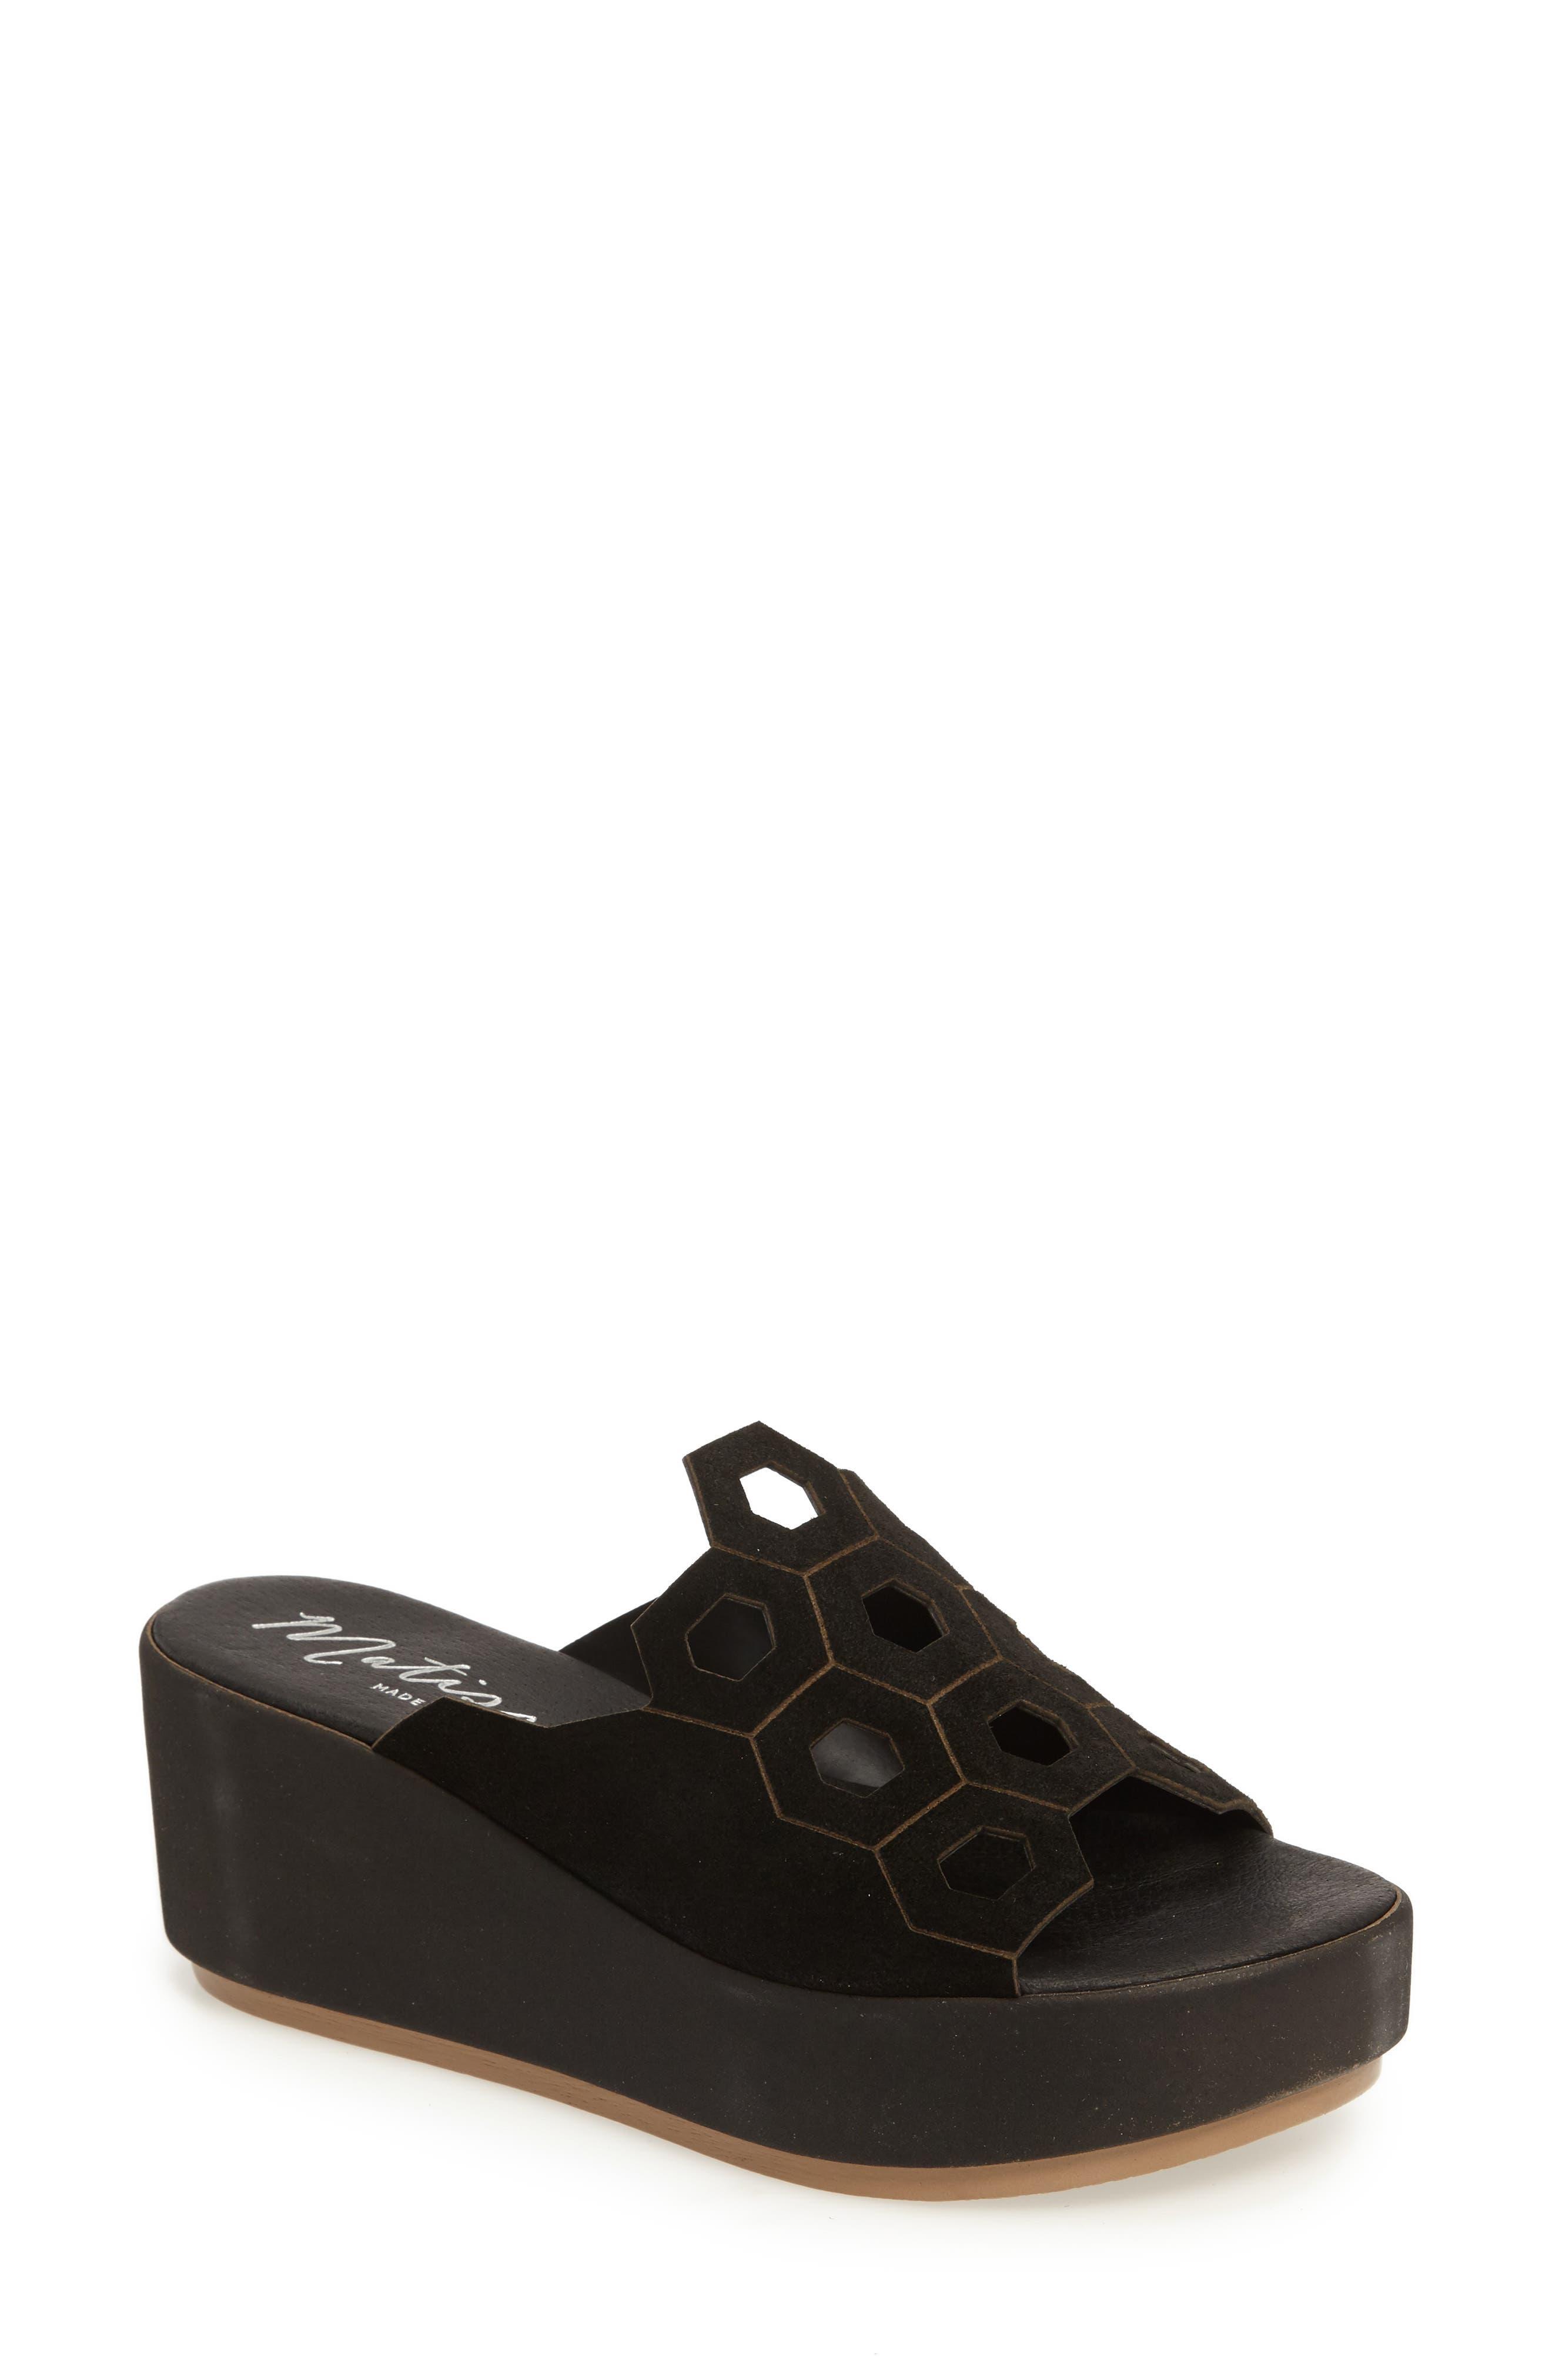 Cabrio Platform Slide,                             Main thumbnail 1, color,                             Black Suede